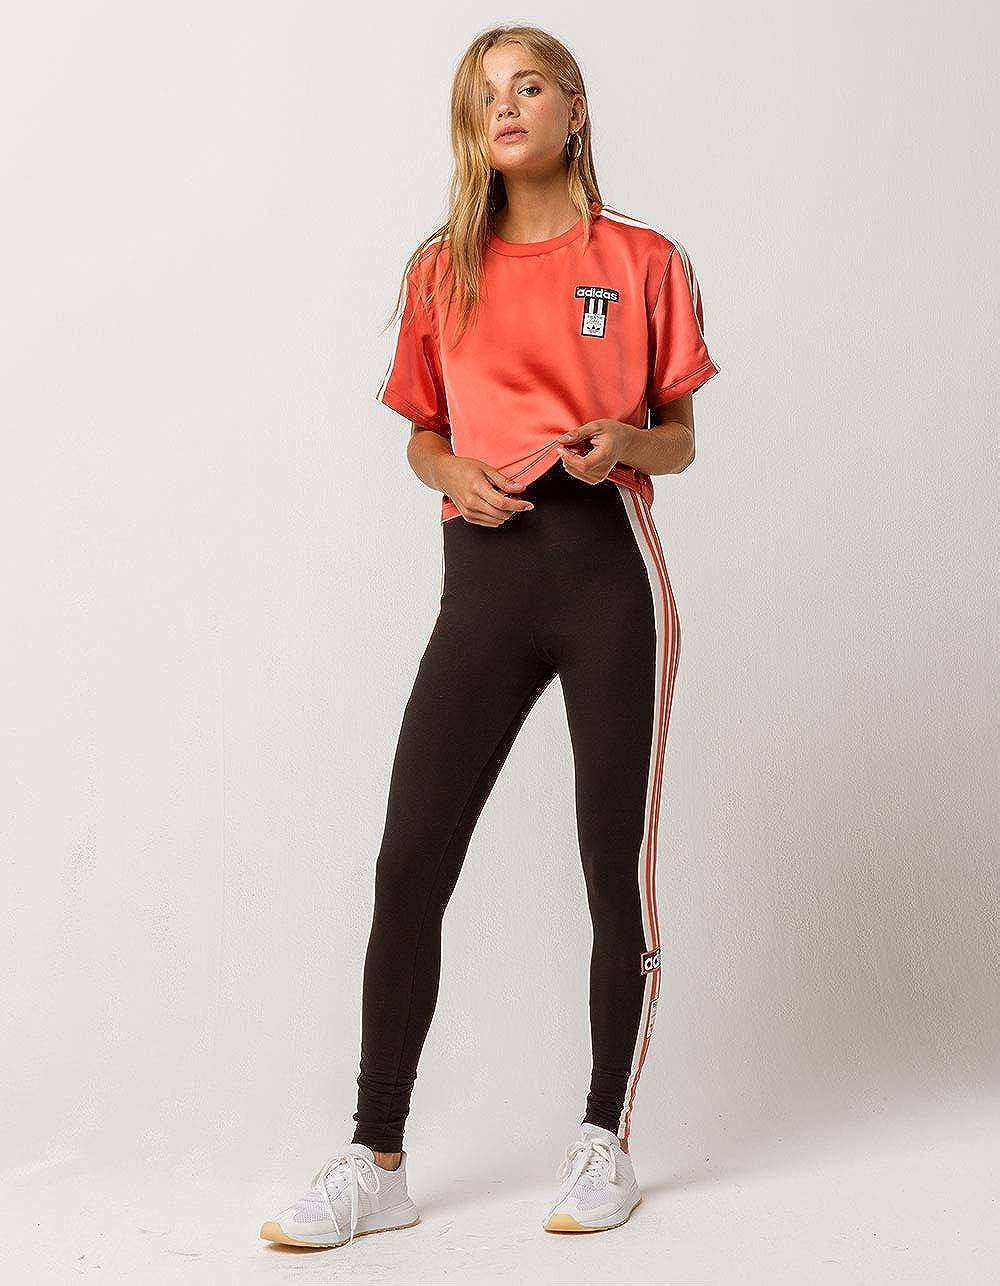 eacdb57dec6d37 Adidas Adibreak Satin Crop Top at Amazon Women s Clothing store